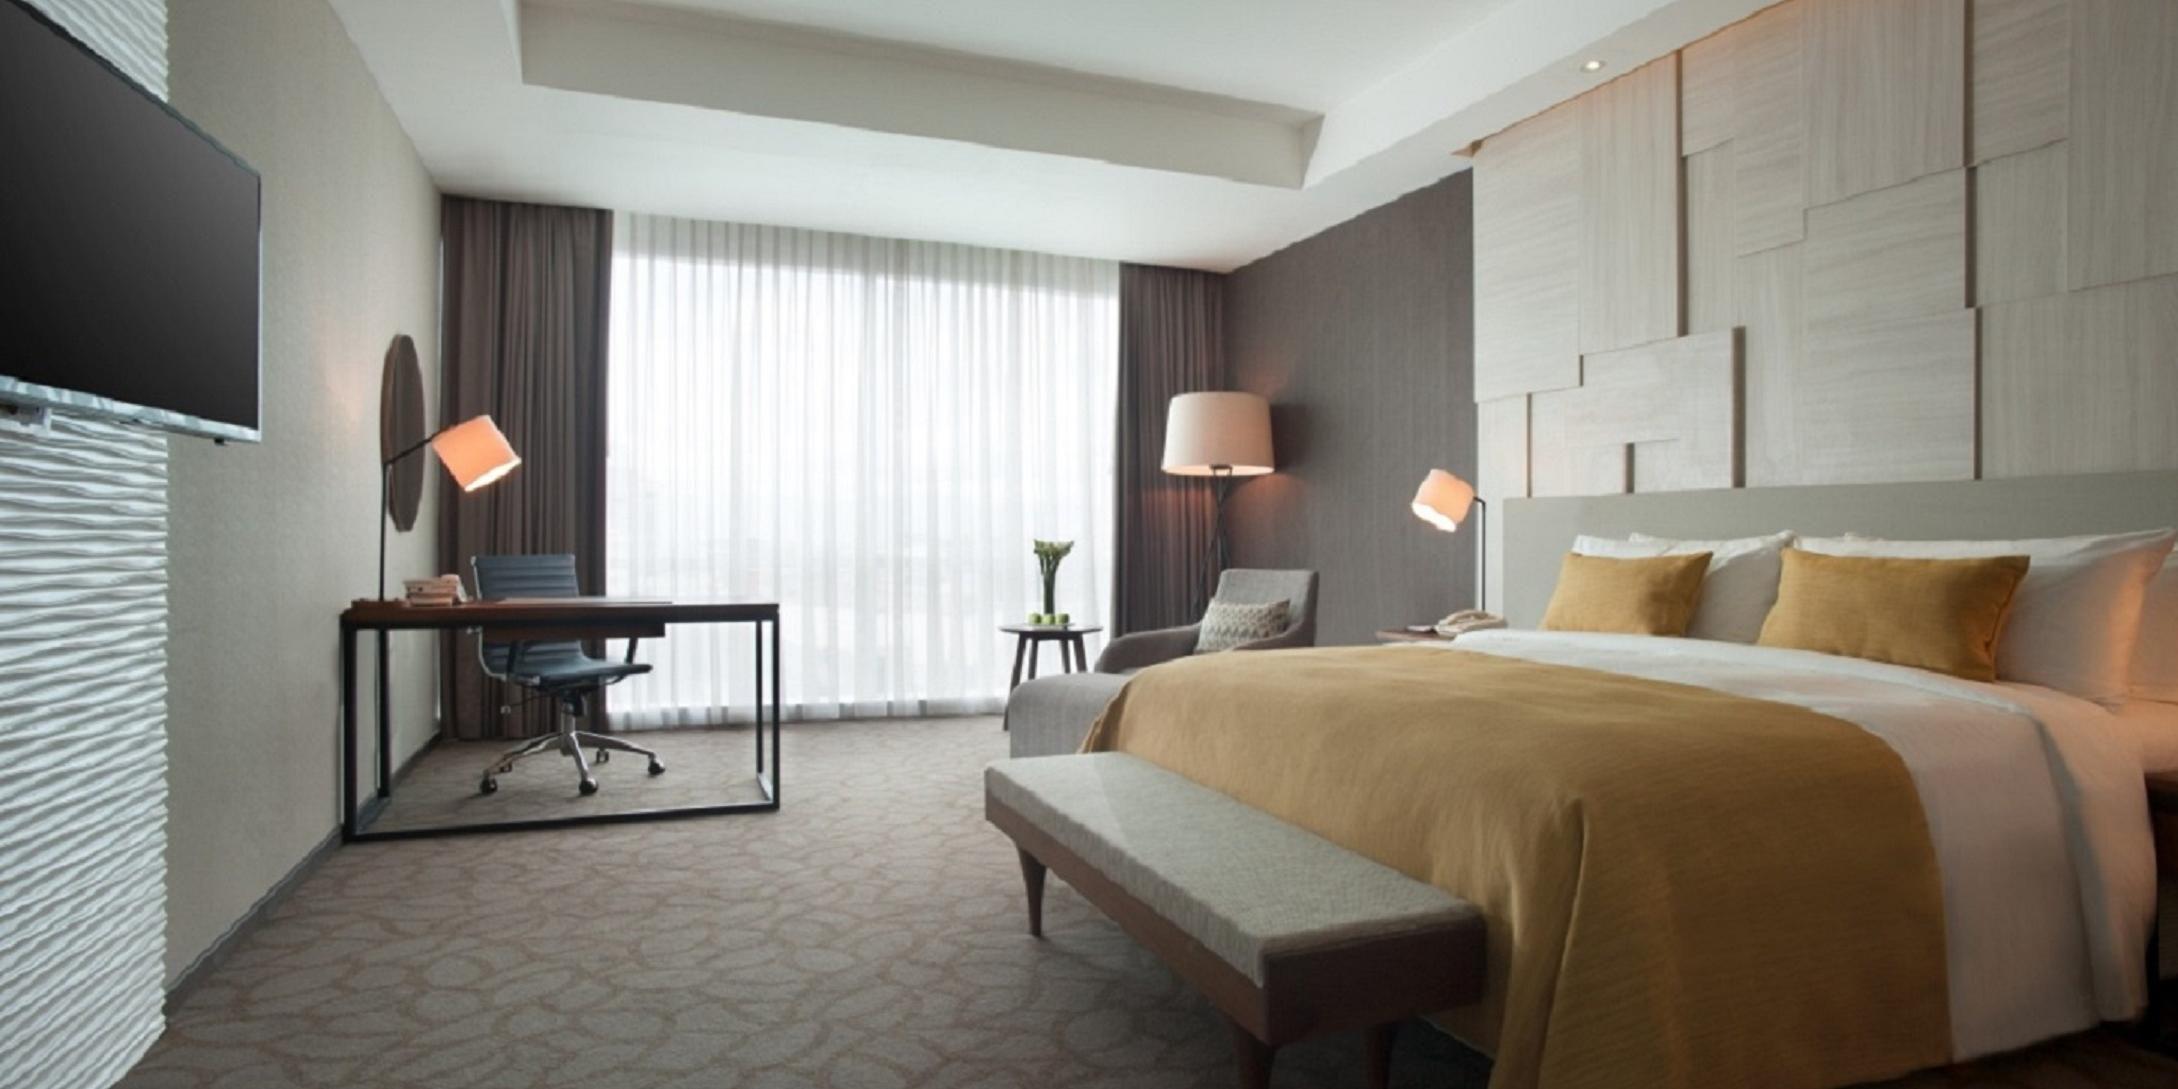 Crowne Plaza Bandung Indonesia Hotel Ihg Paket Murmer Acces Point Komplit Extra 1 For Sunday Monday Getaway